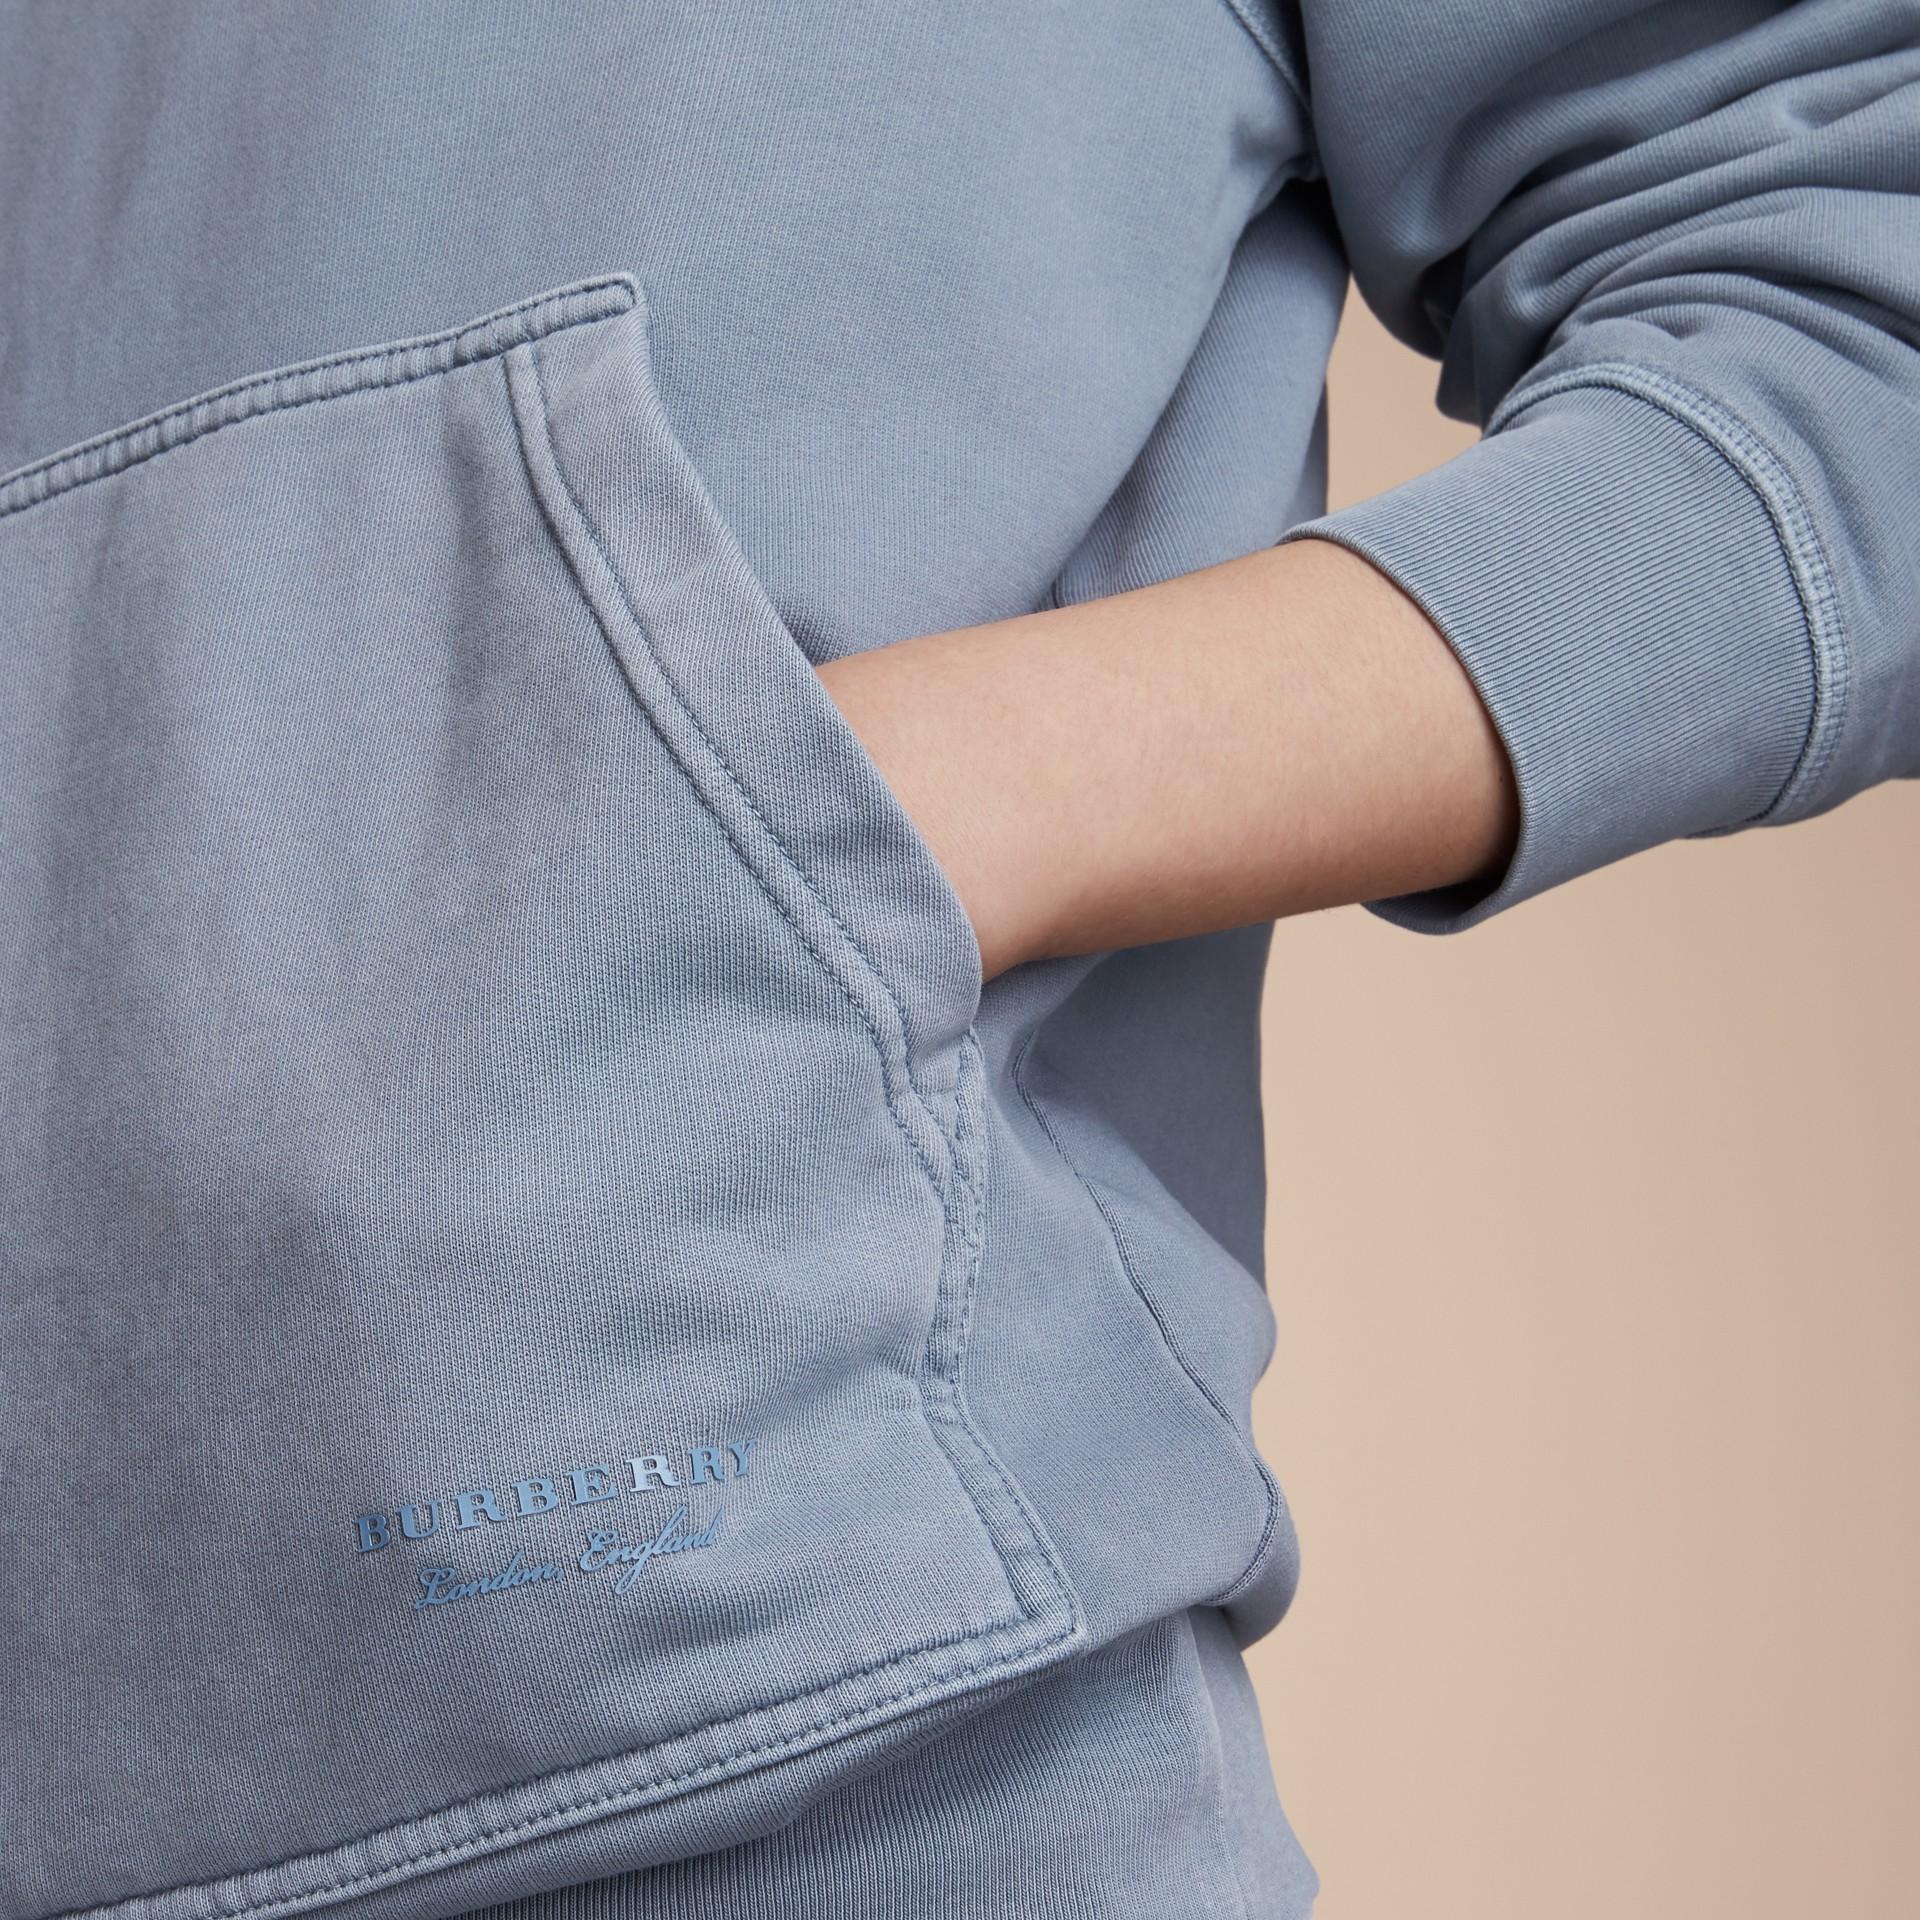 Unisex Pigment-dyed Cotton Oversize Sweatshirt in Dusty Blue - Women | Burberry Singapore - gallery image 5